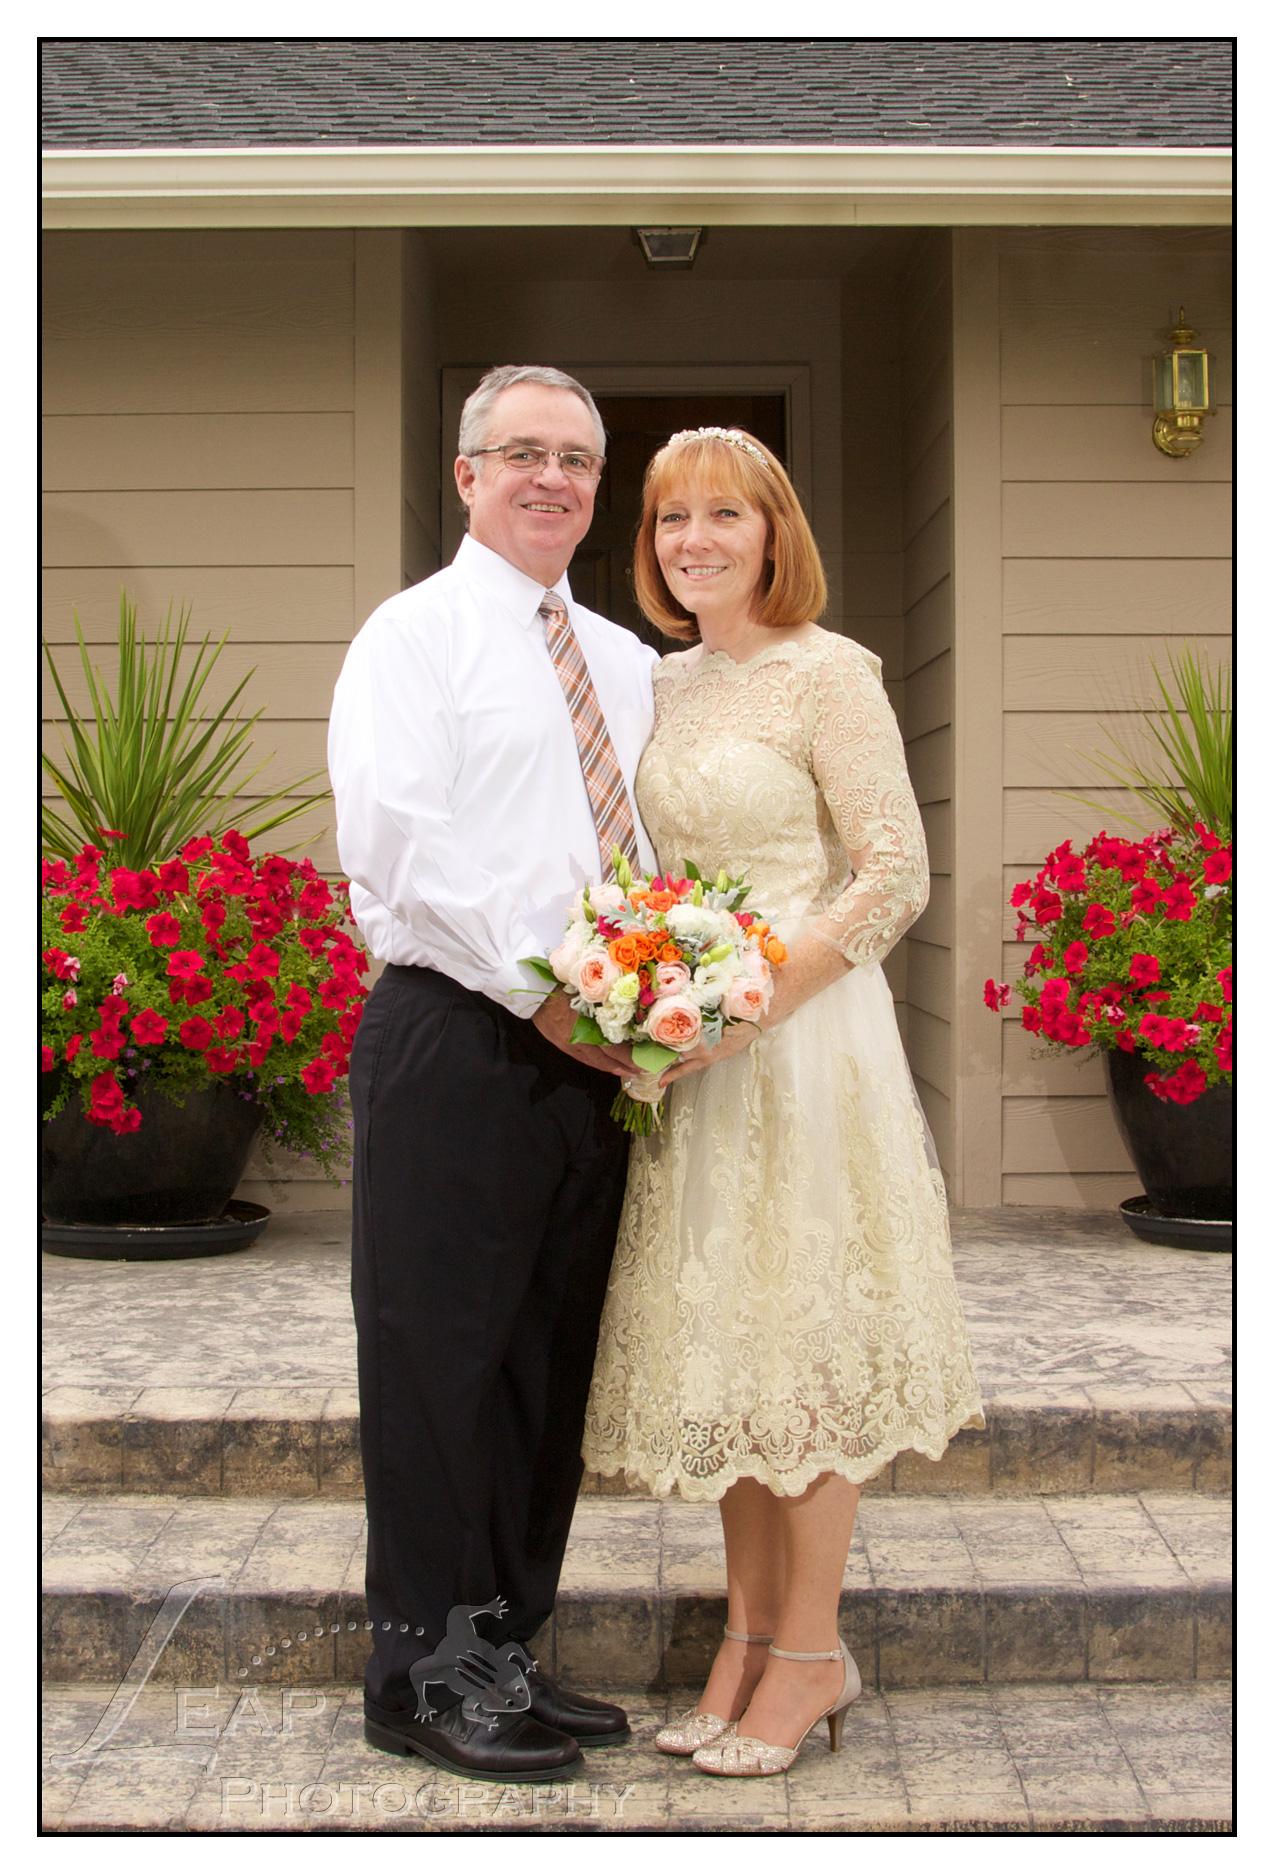 jim ruth married boise wedding photographers blog With boise wedding photographers